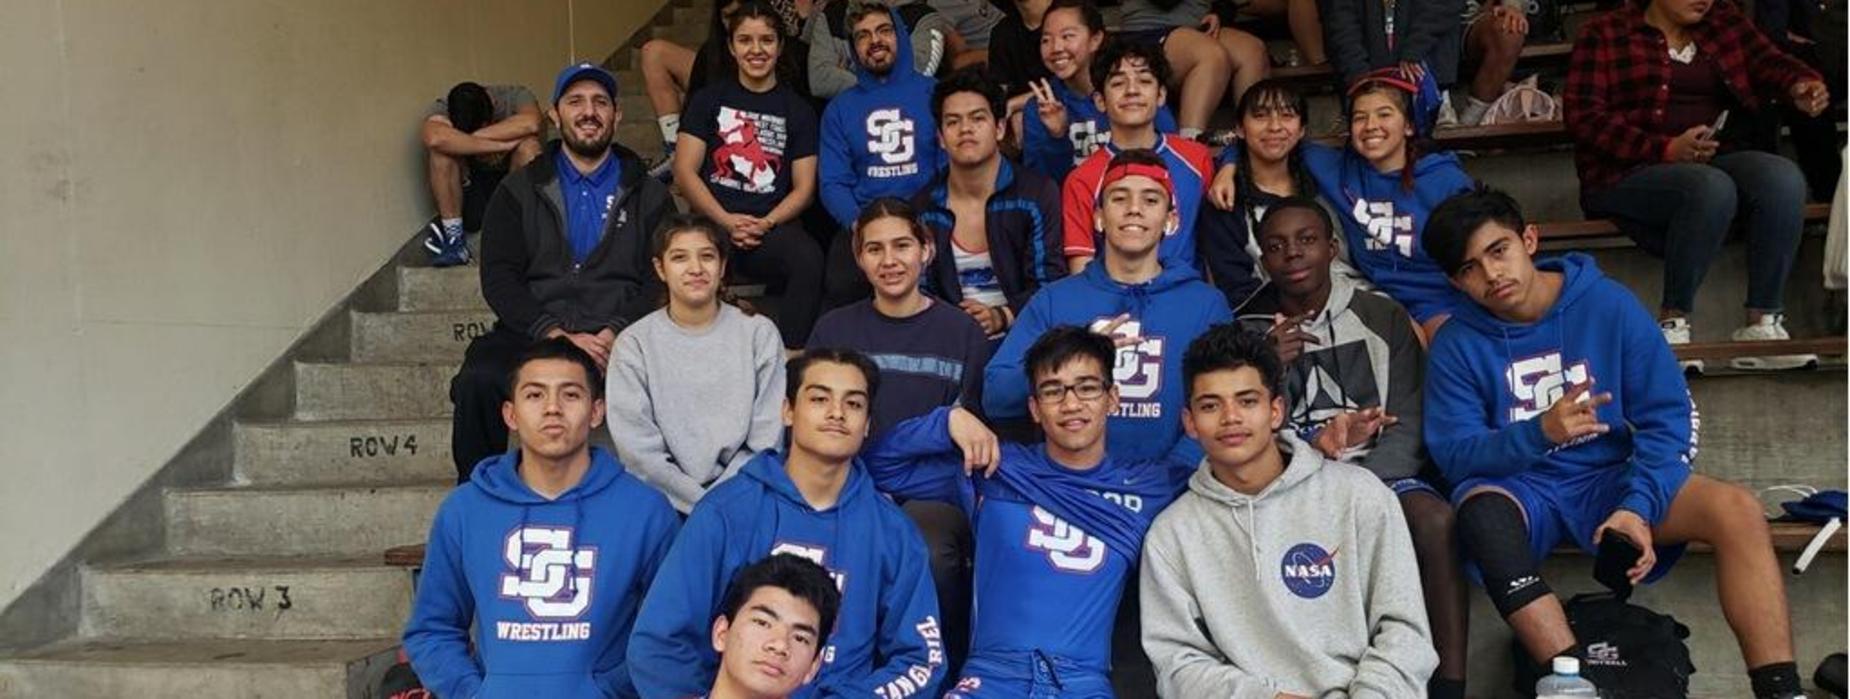 Matador Wrestling Team